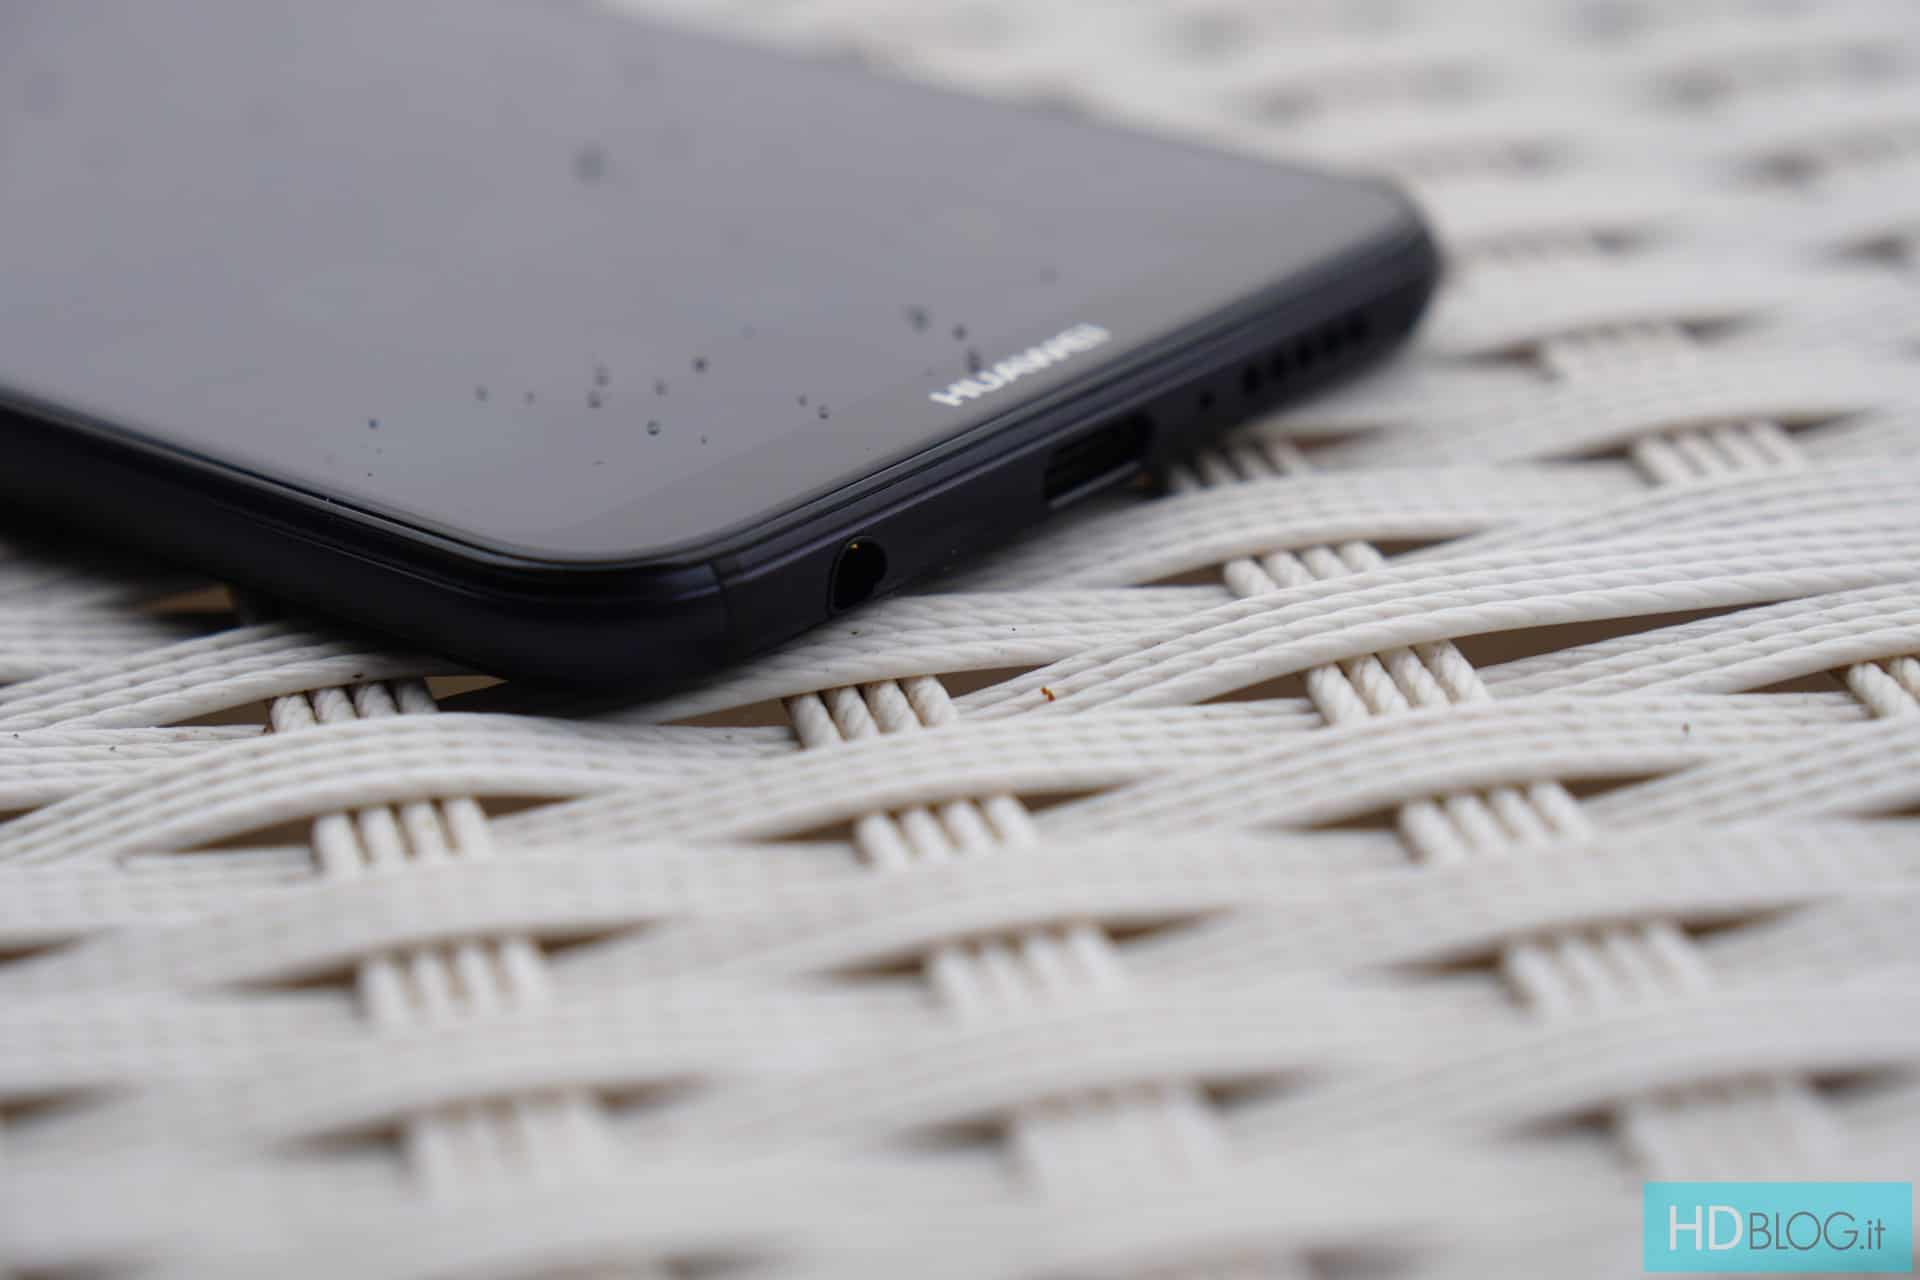 Huawei P20 Lite HDBlog image prelaunch 20